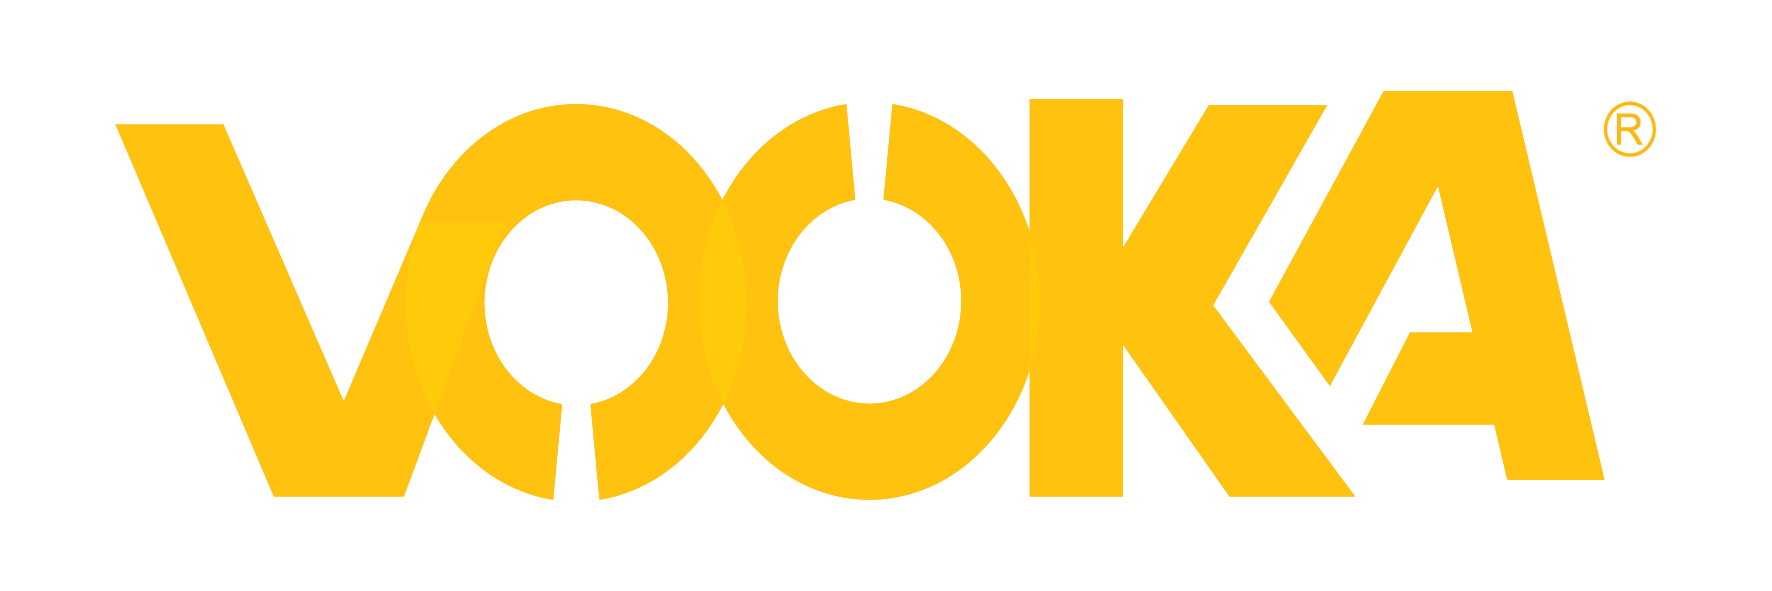 VOOKA